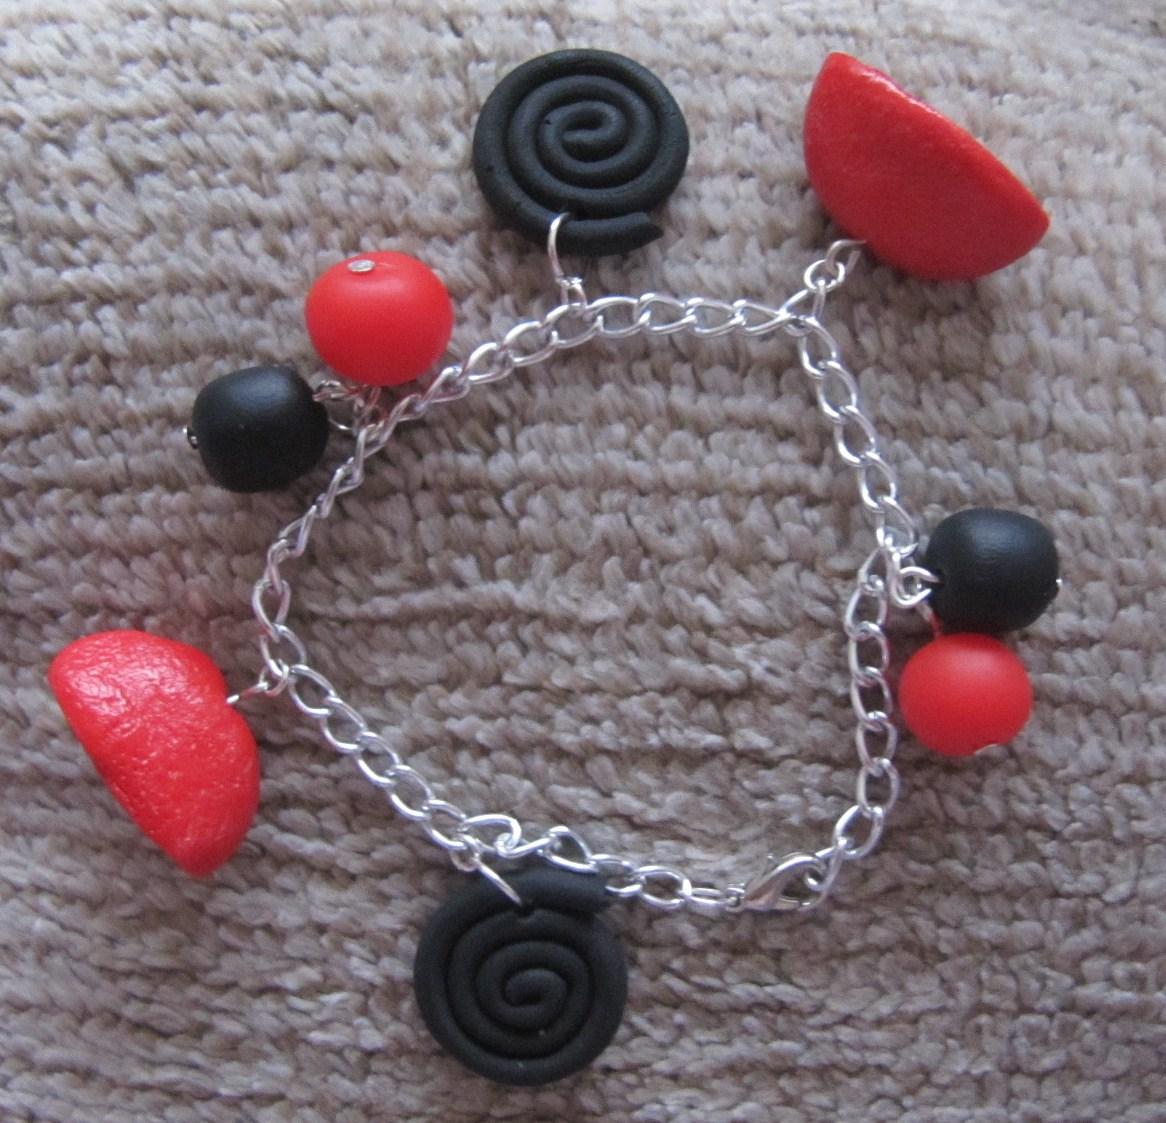 bijoux de cr ation en p te fimo bracelet breloques bonbons fimo. Black Bedroom Furniture Sets. Home Design Ideas